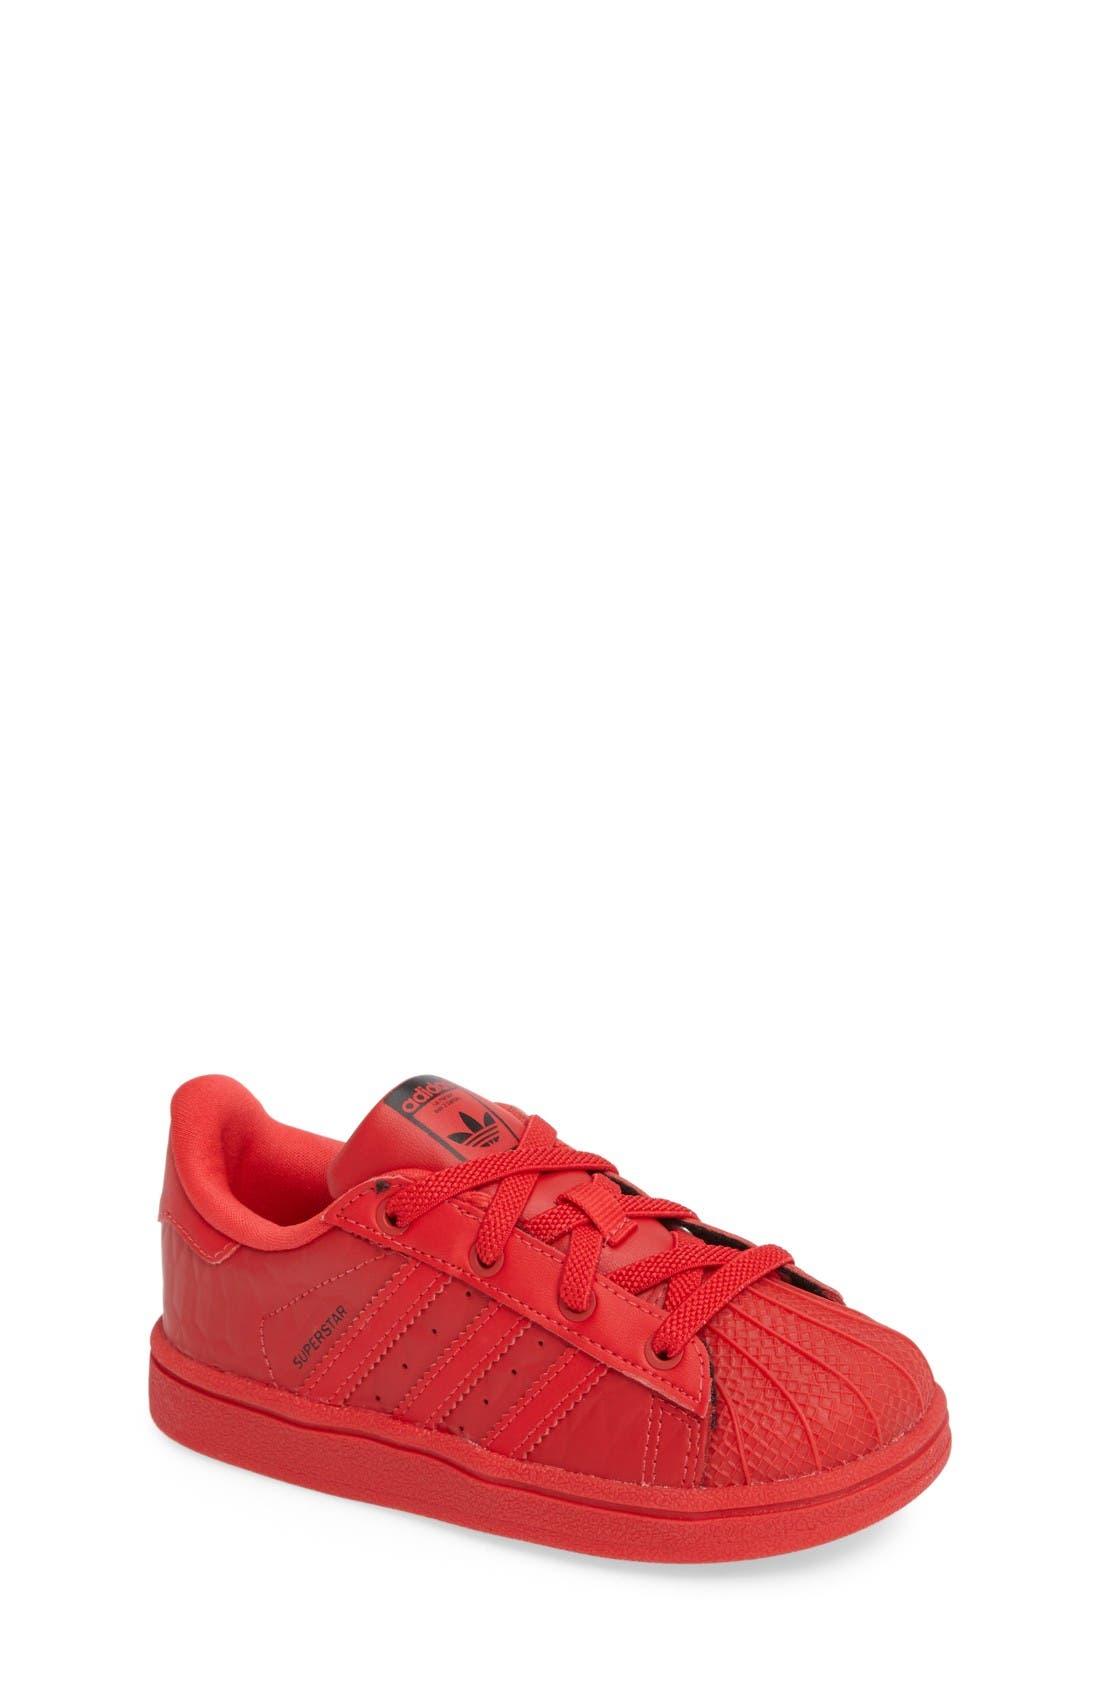 Alternate Image 1 Selected - adidas Superstar Sneaker (Baby, Walker & Toddler)